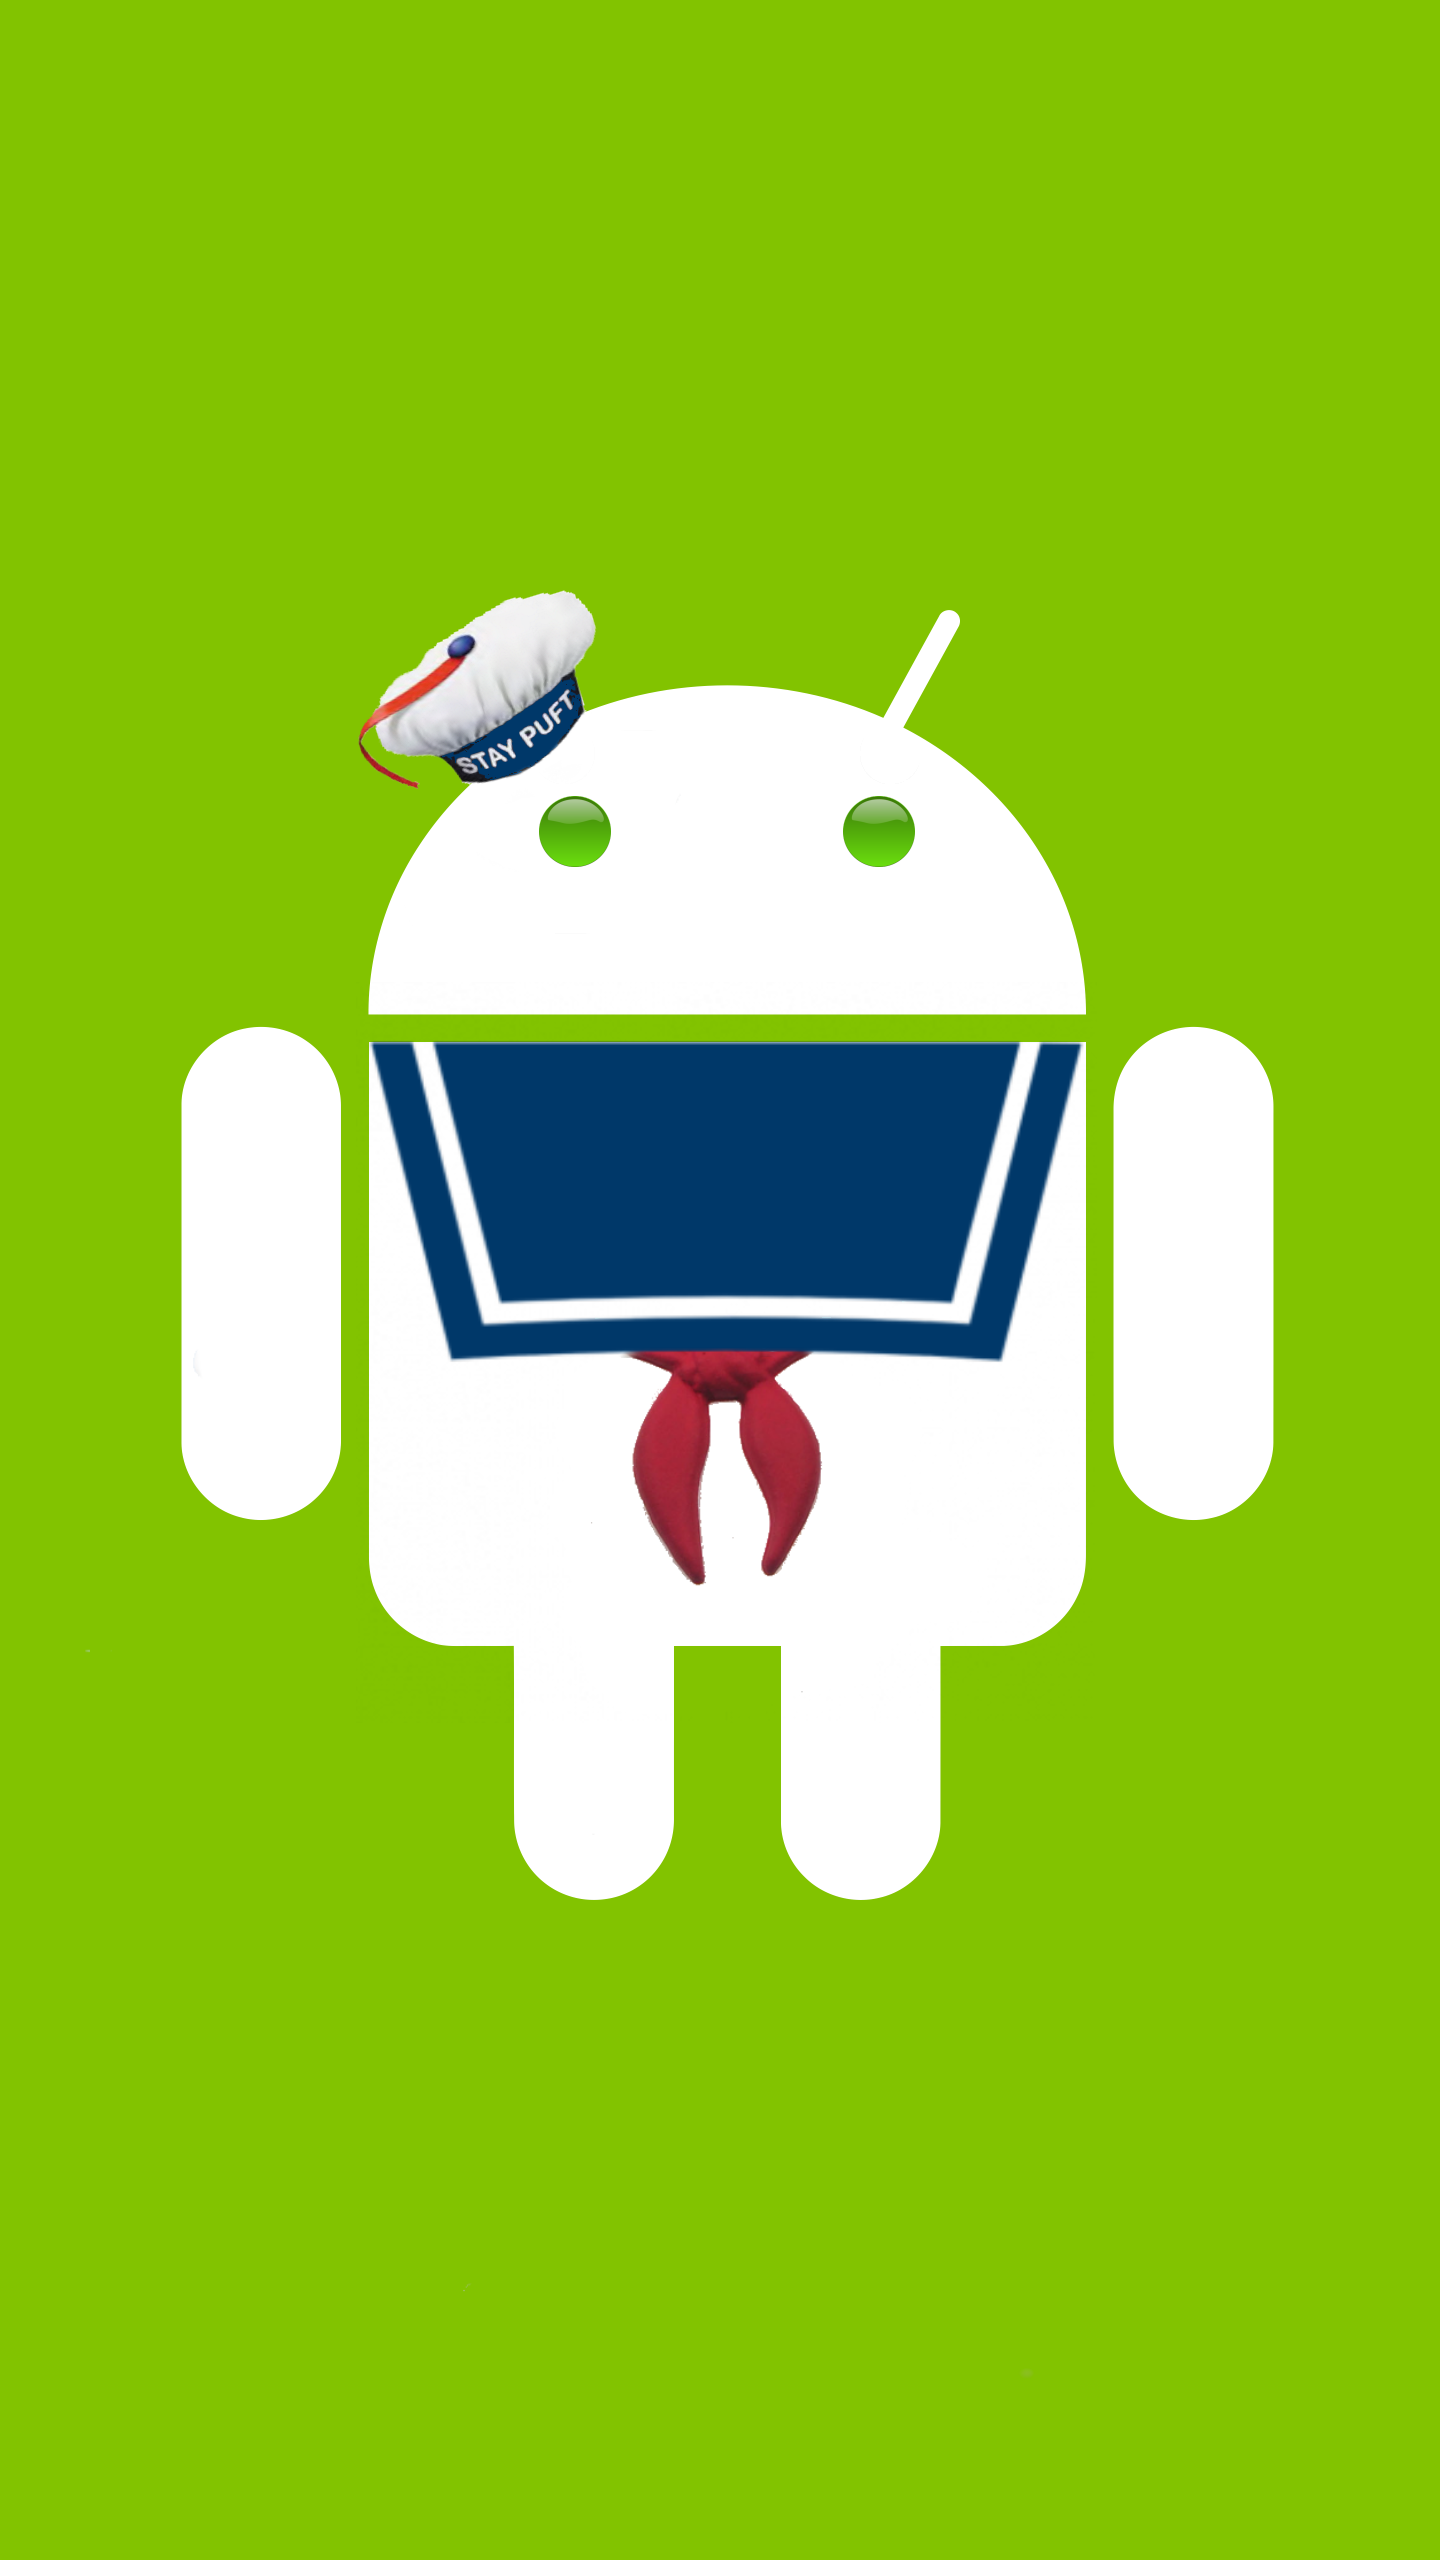 Loving Android M iimgurcom 1440x2560